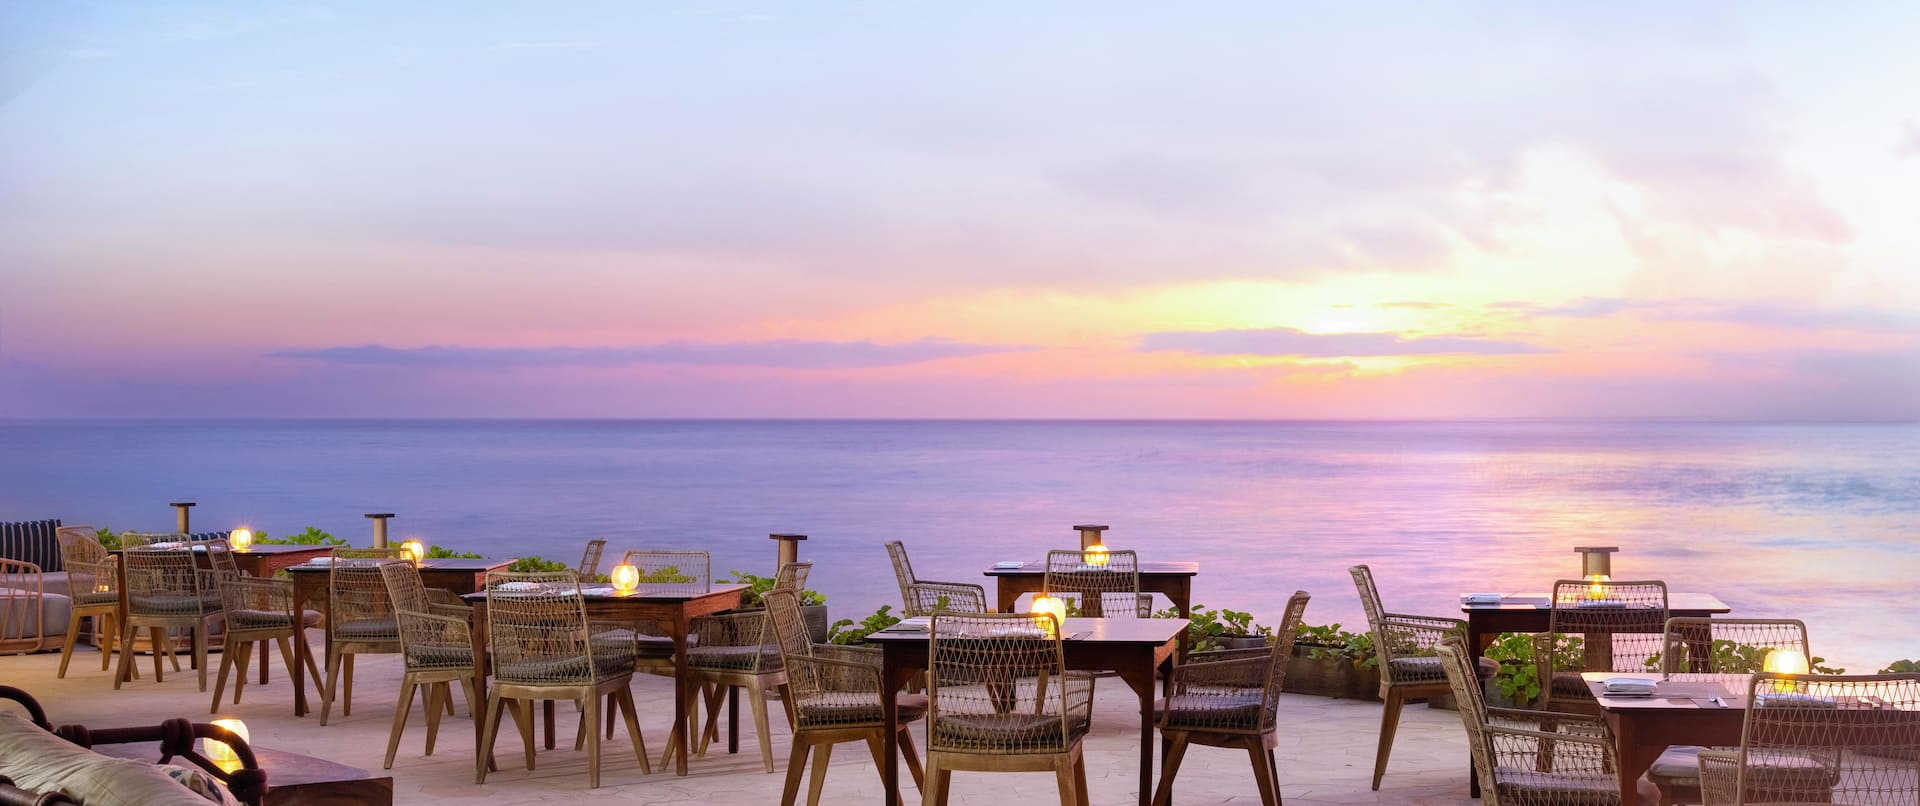 The Shore Restaurant